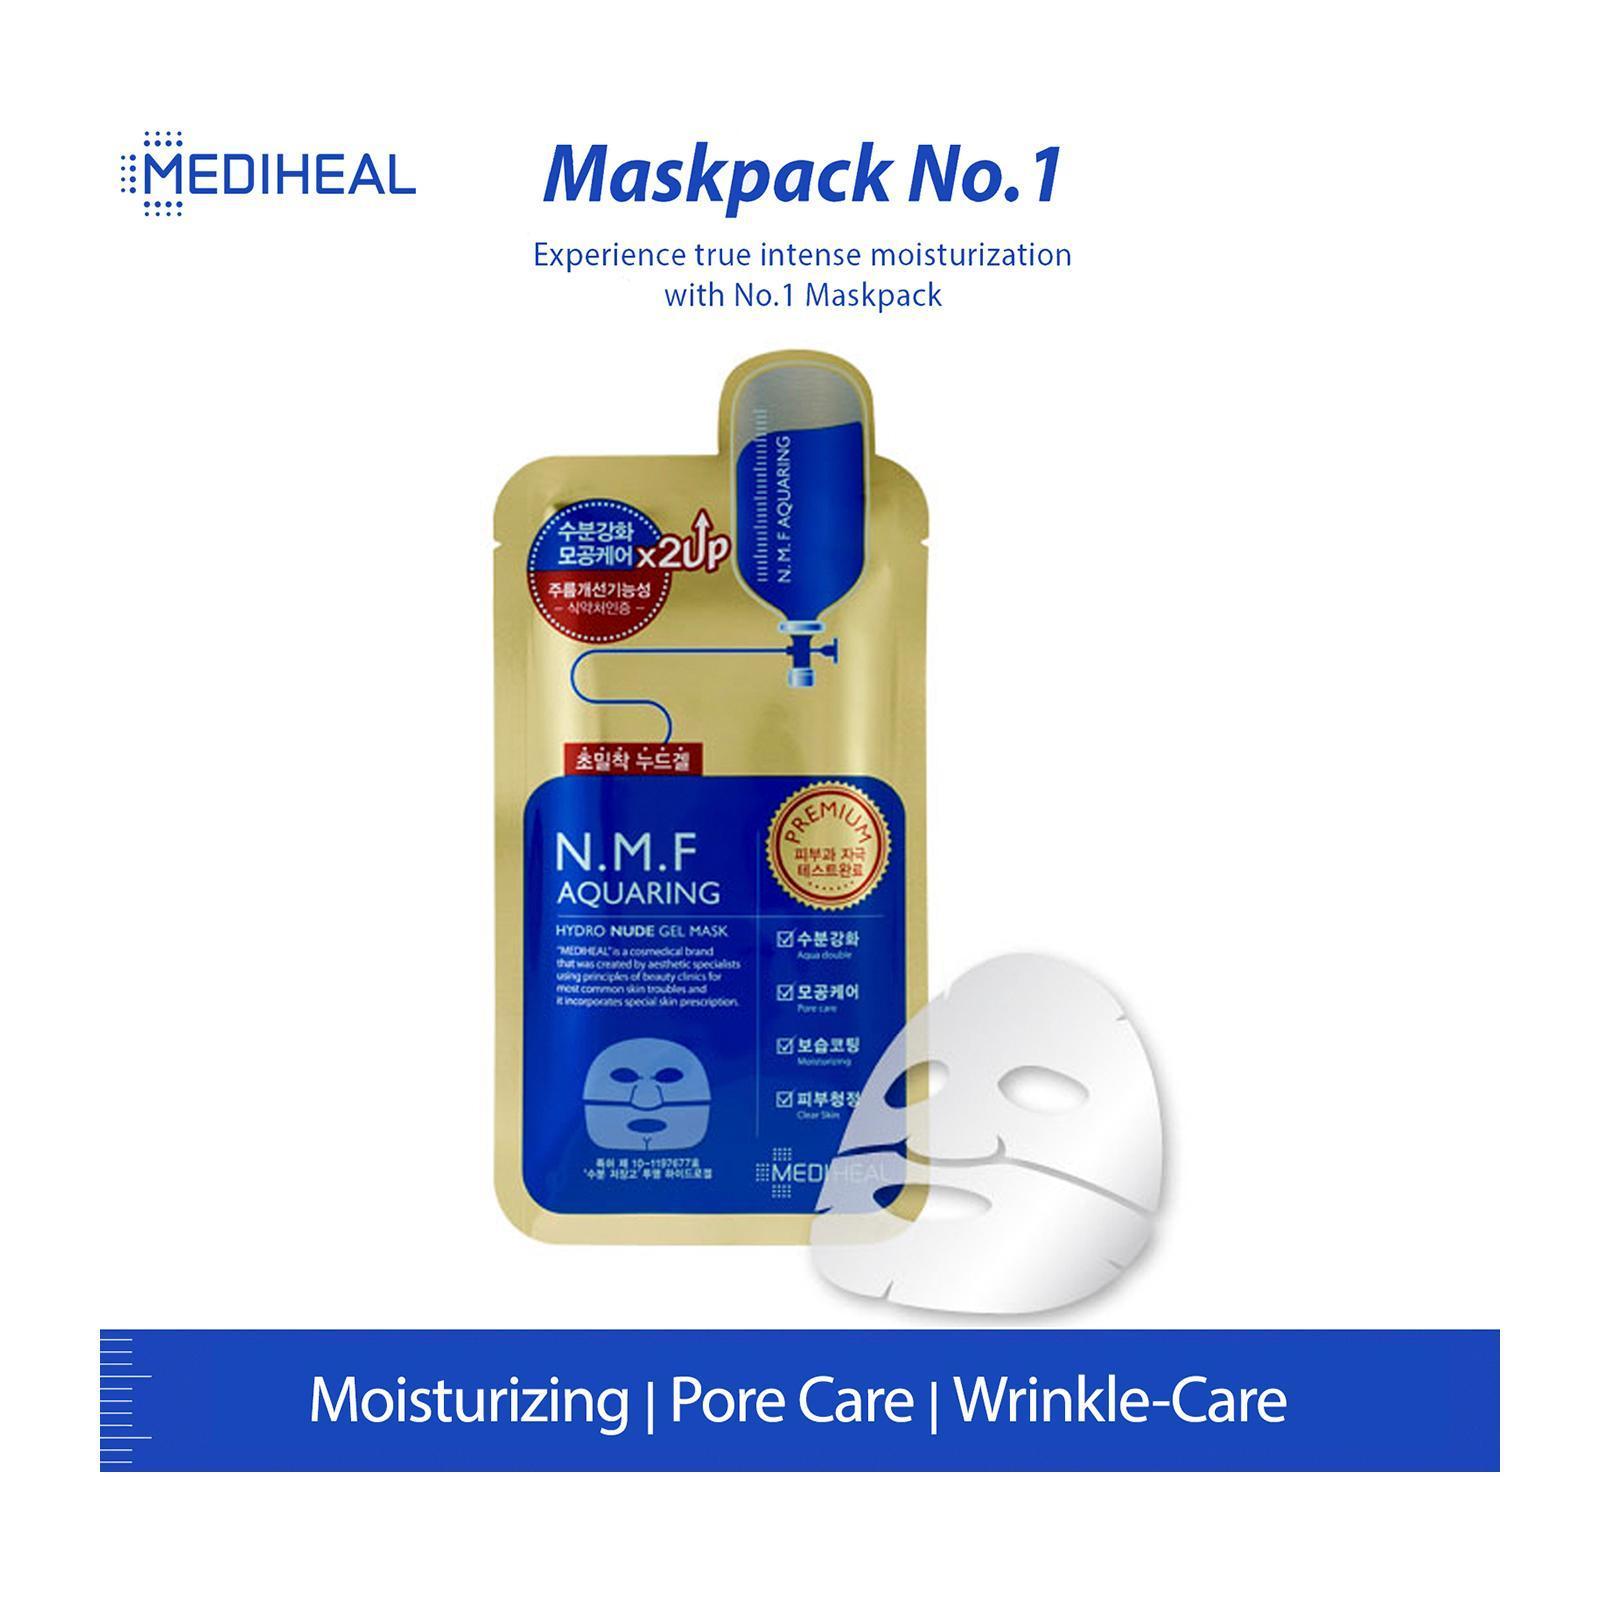 Mediheal Nmf Hydro Nude Gel Mask 1s